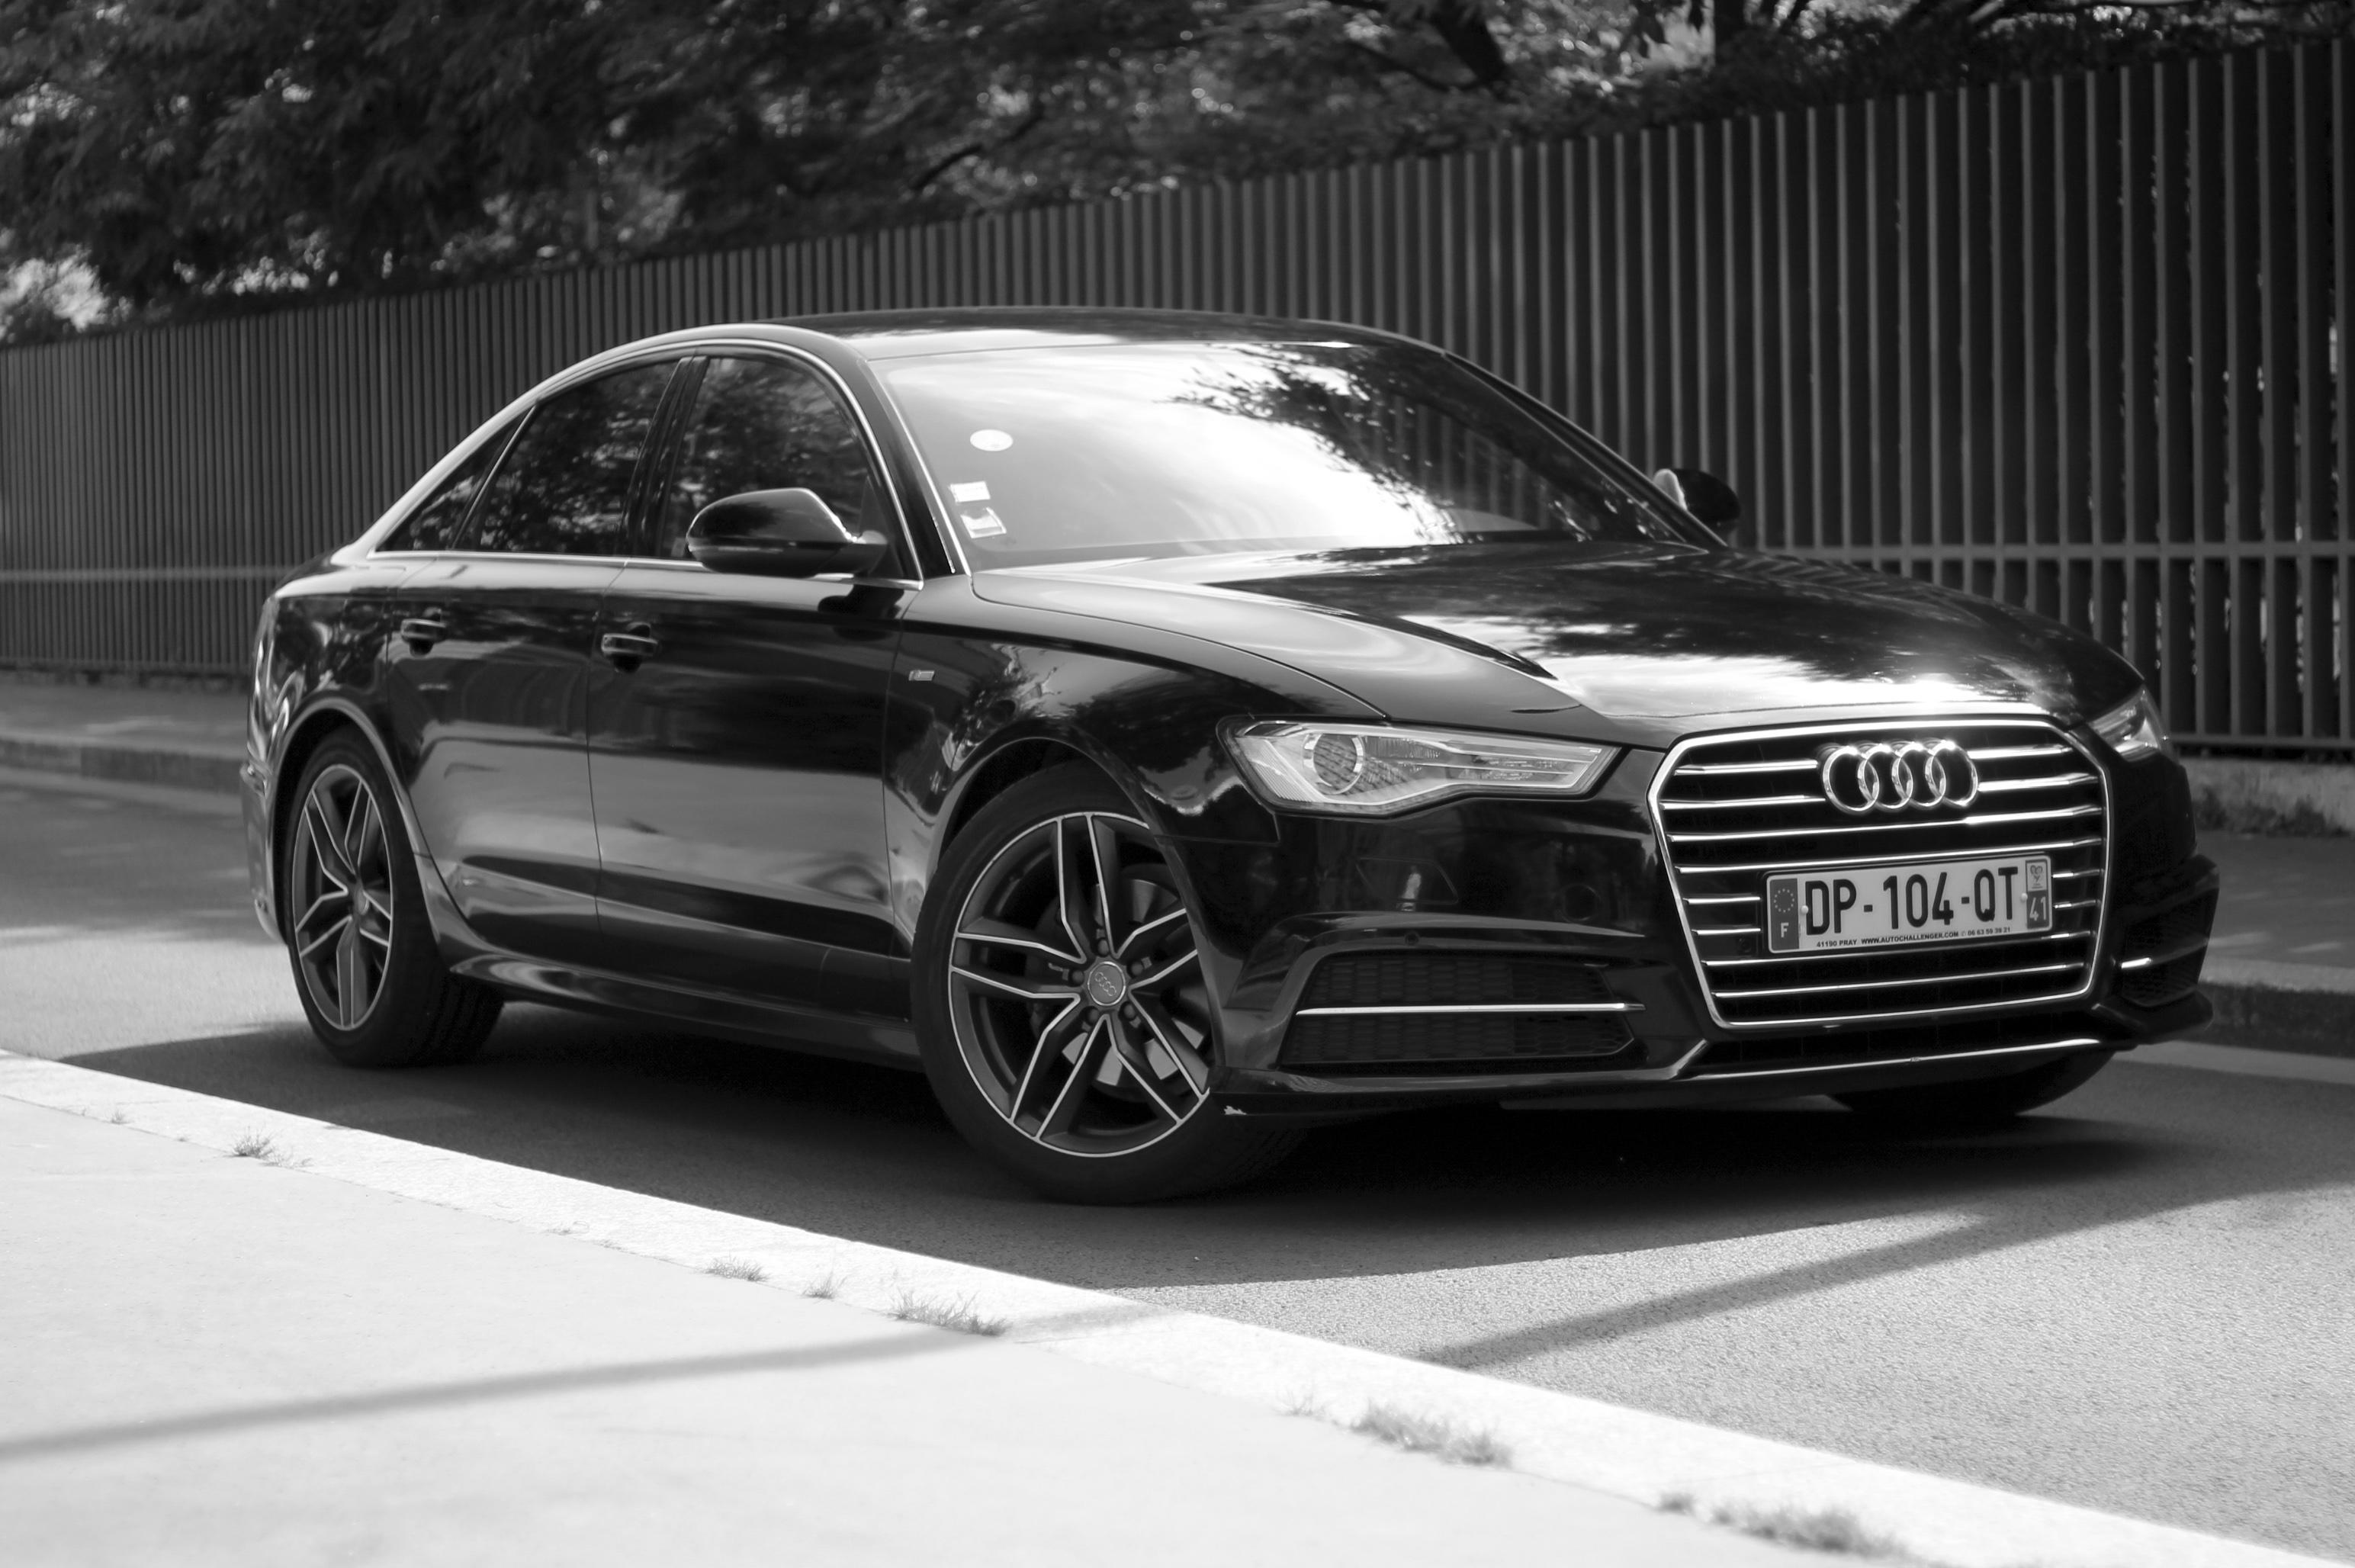 Audi SLine HD 1 n&b